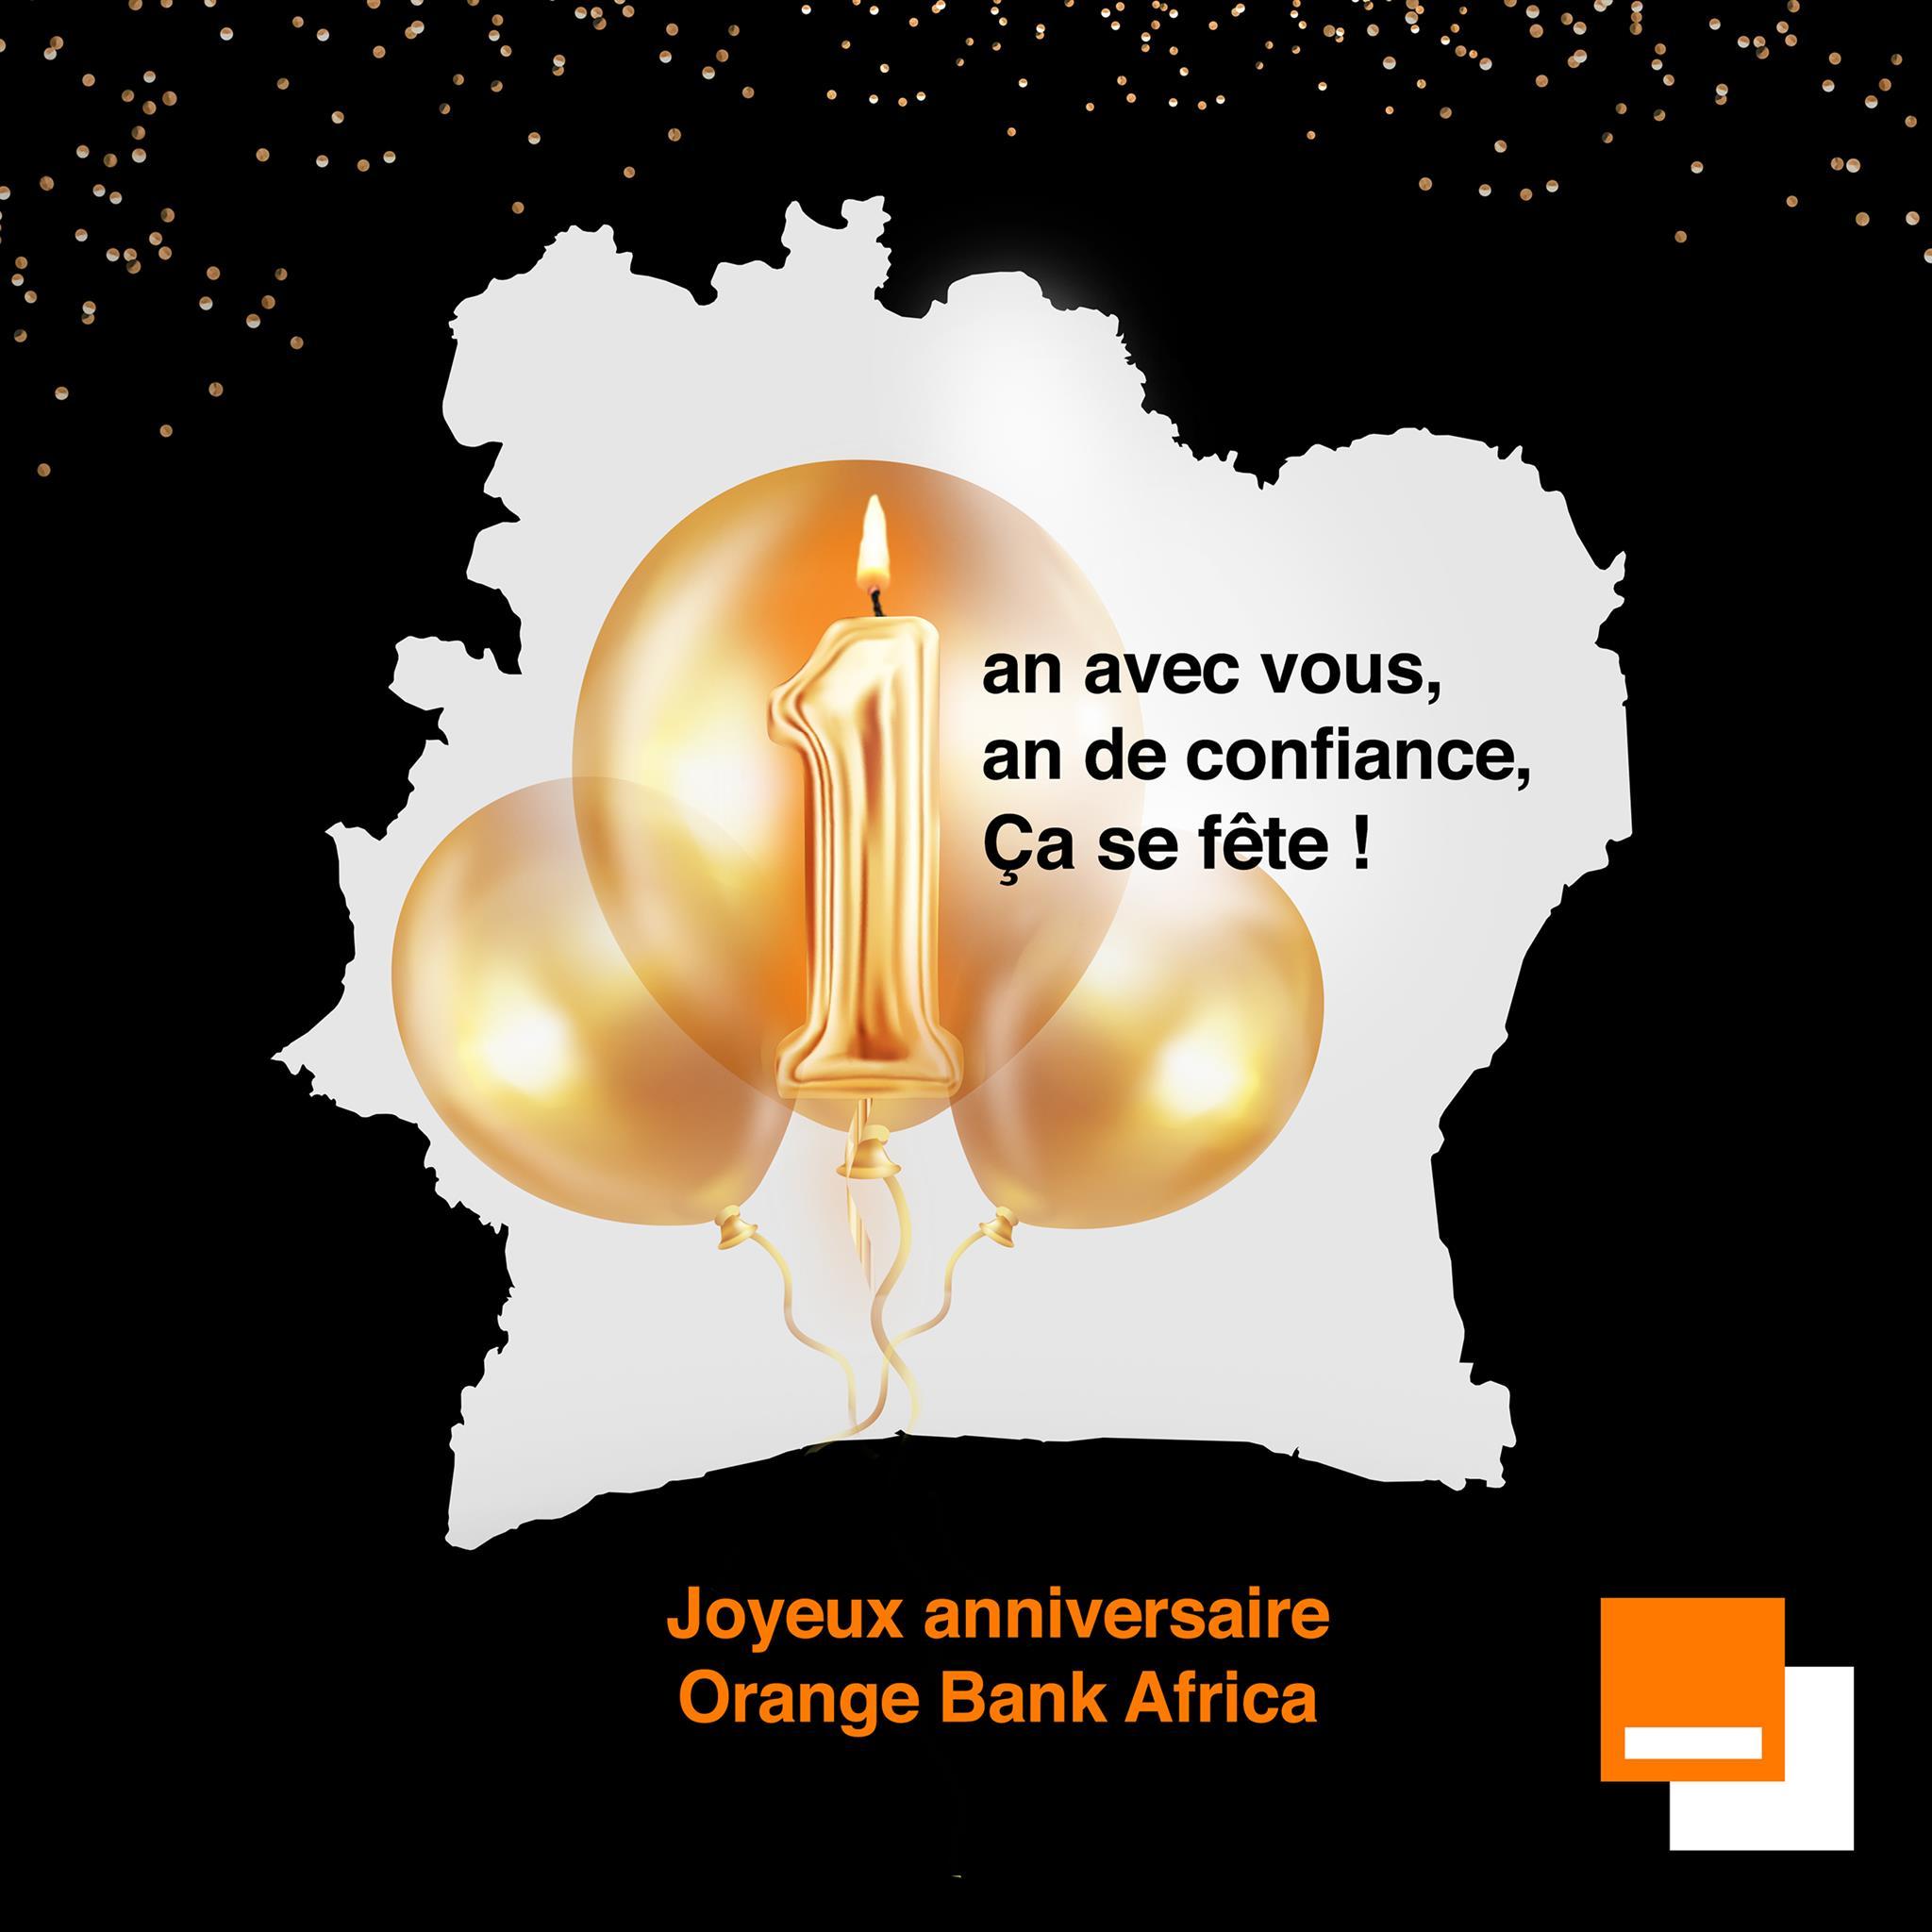 Anniversaire Orange Bank